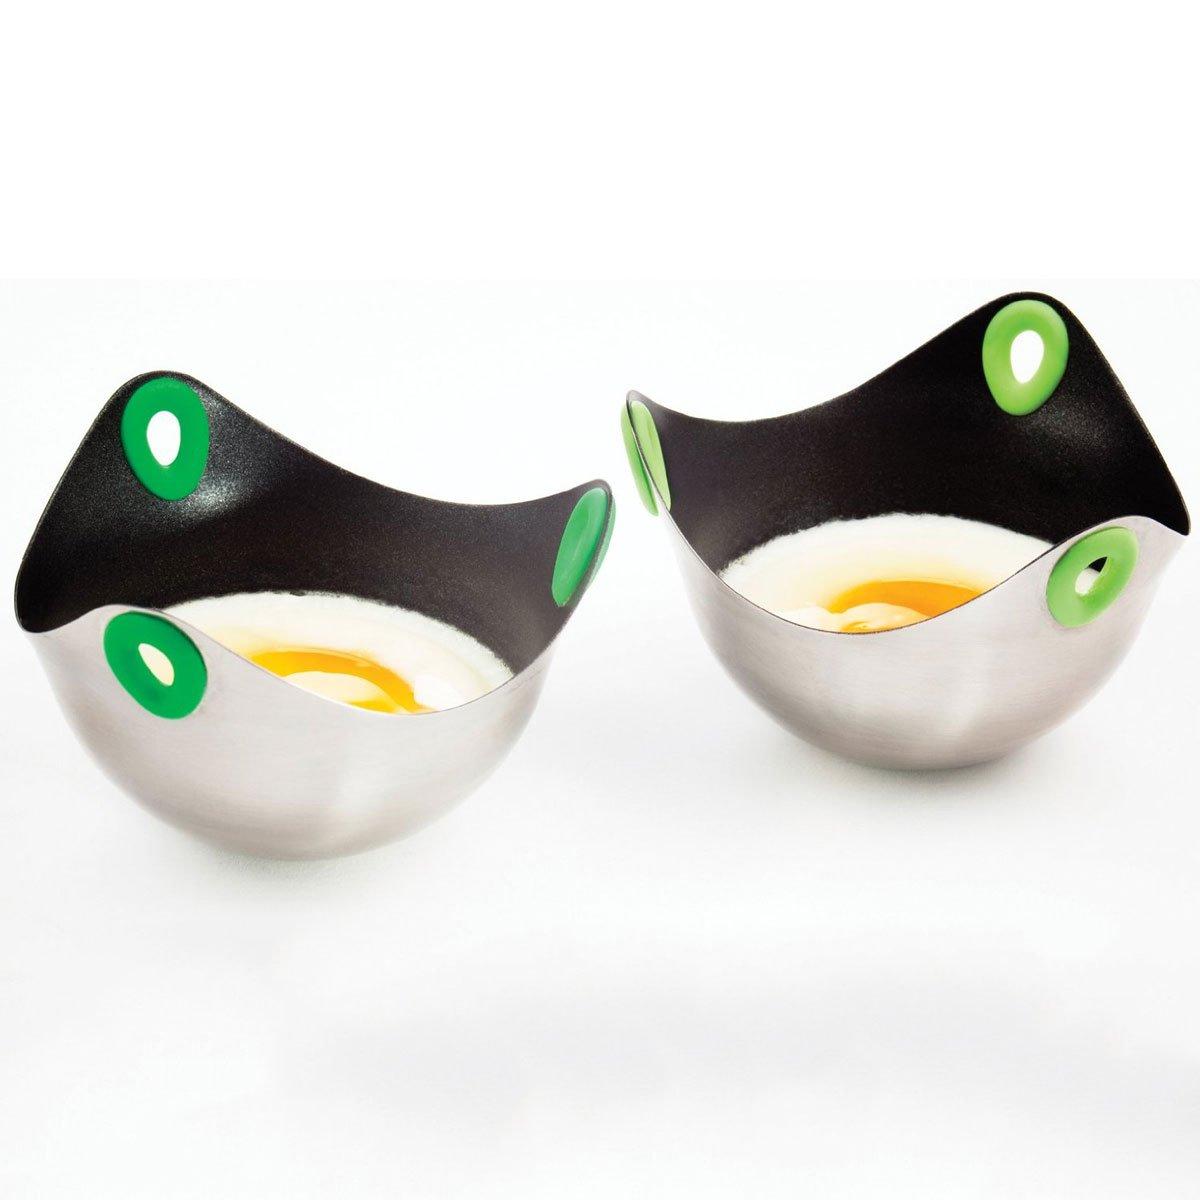 Poachpod Stainless Floating Egg Poachers